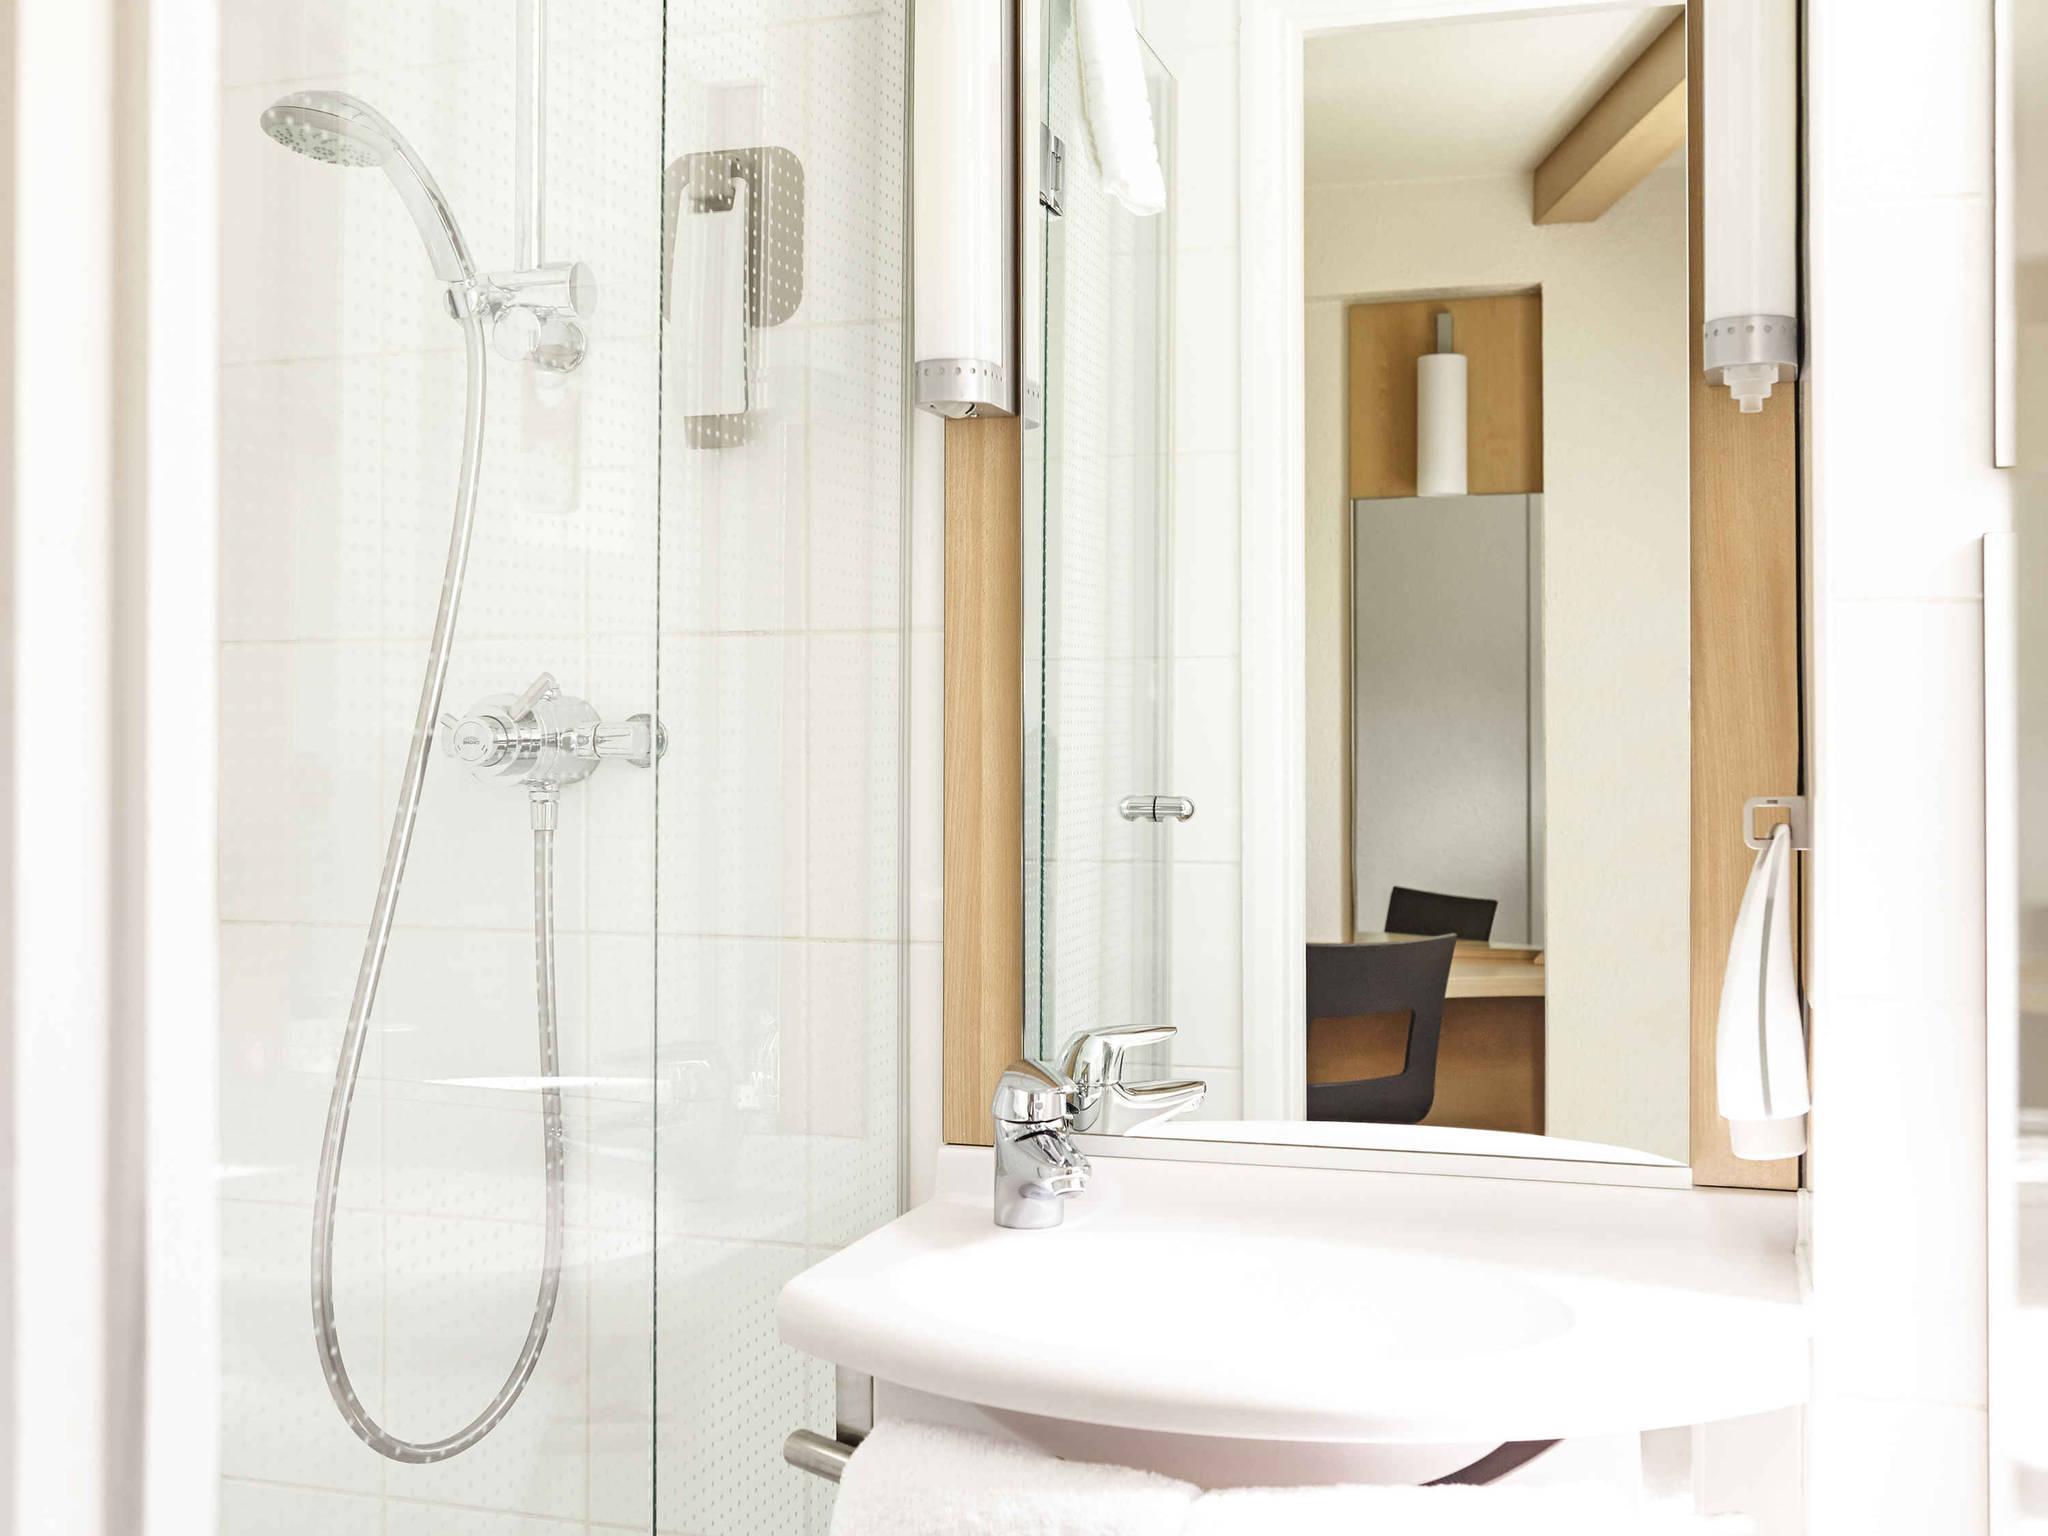 Ibis Leeds Centre | Well Equipped & Modern Hotel in Leeds